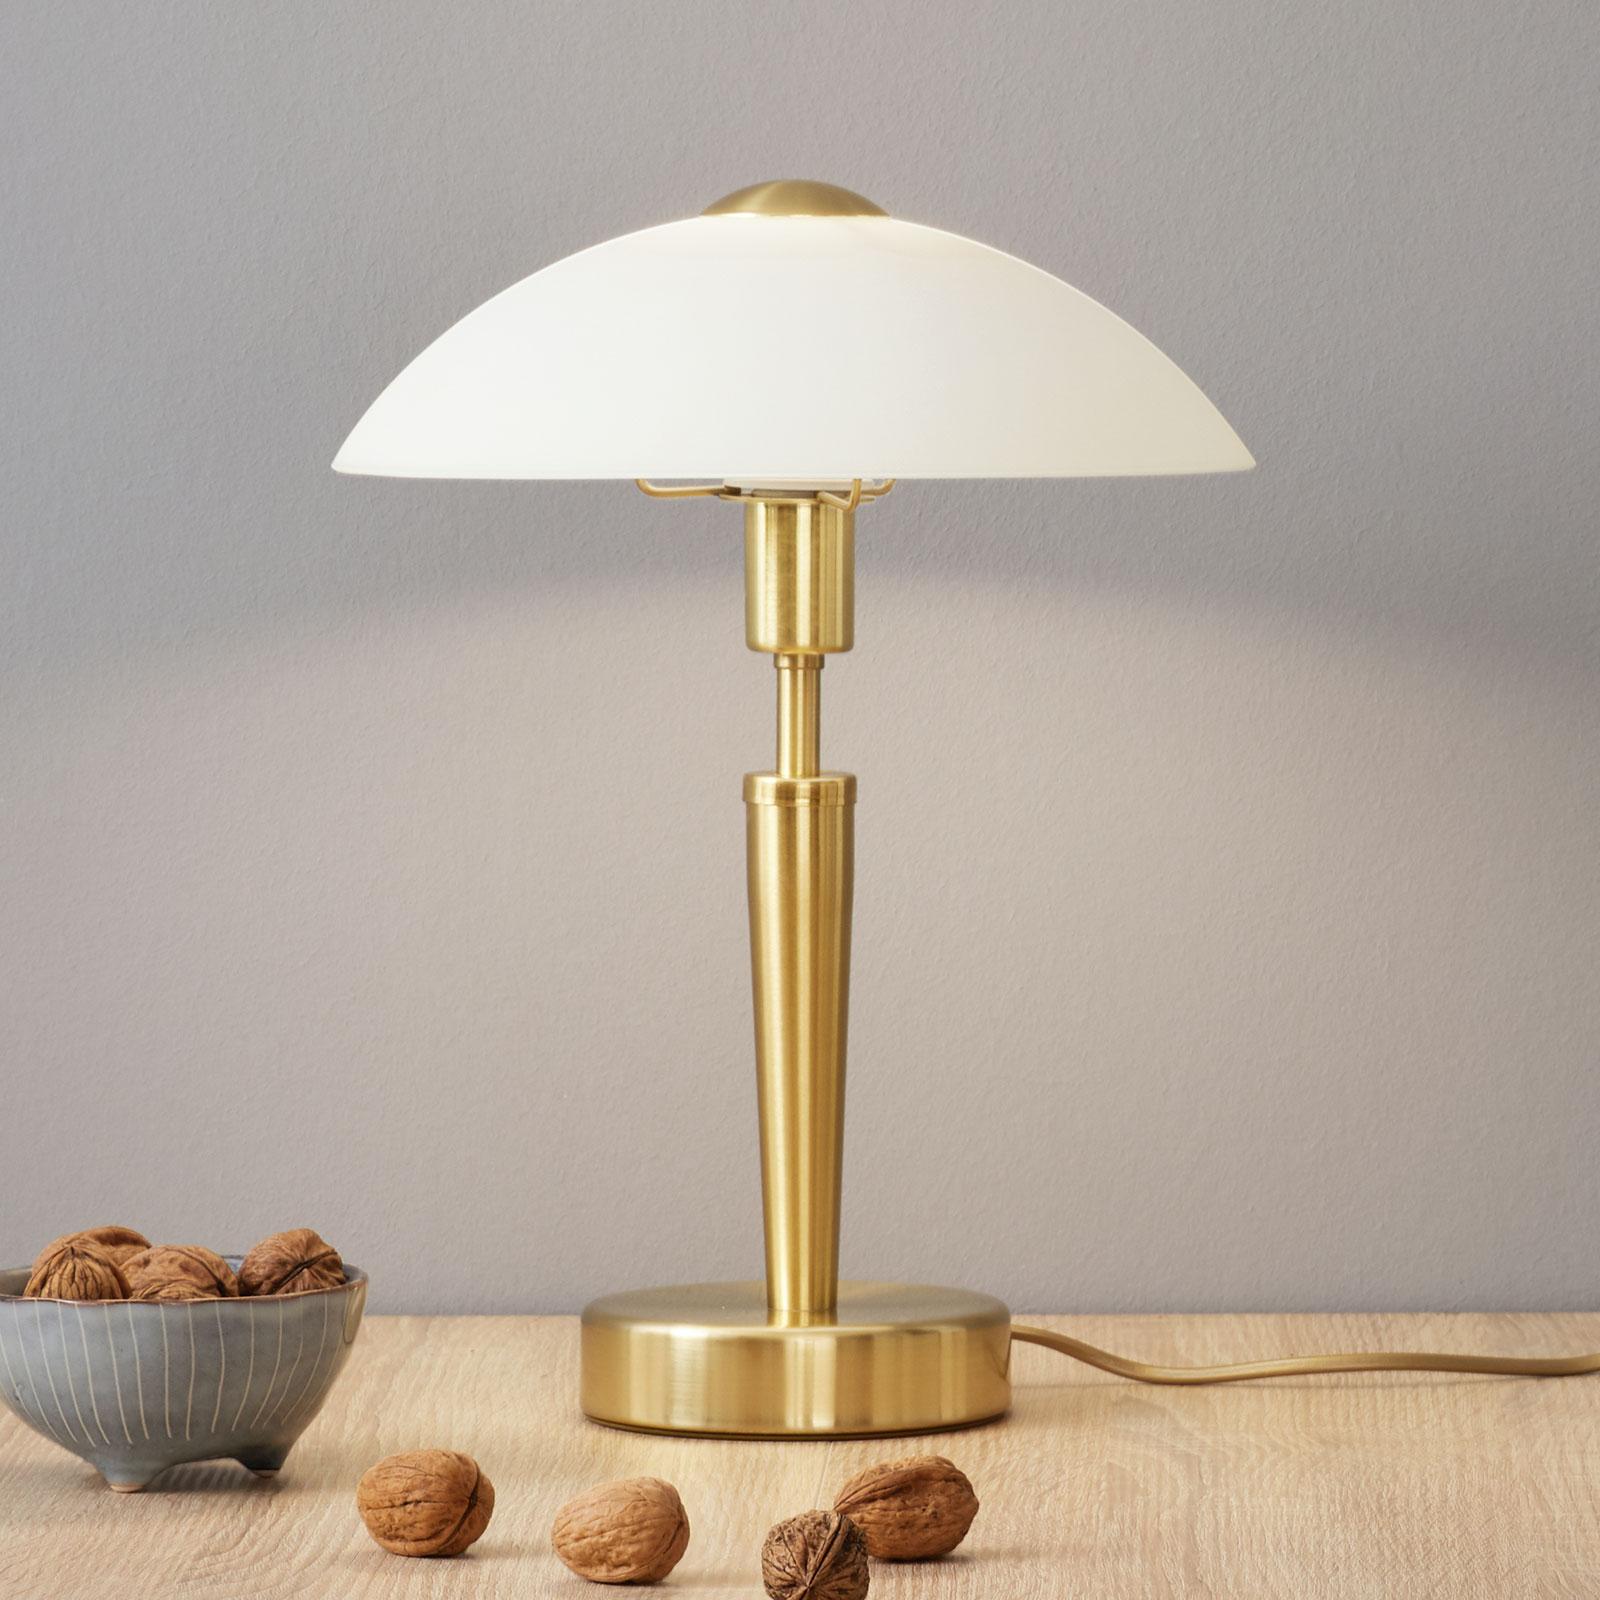 Elegante lampada da tavolo Salut, ottone, bianco